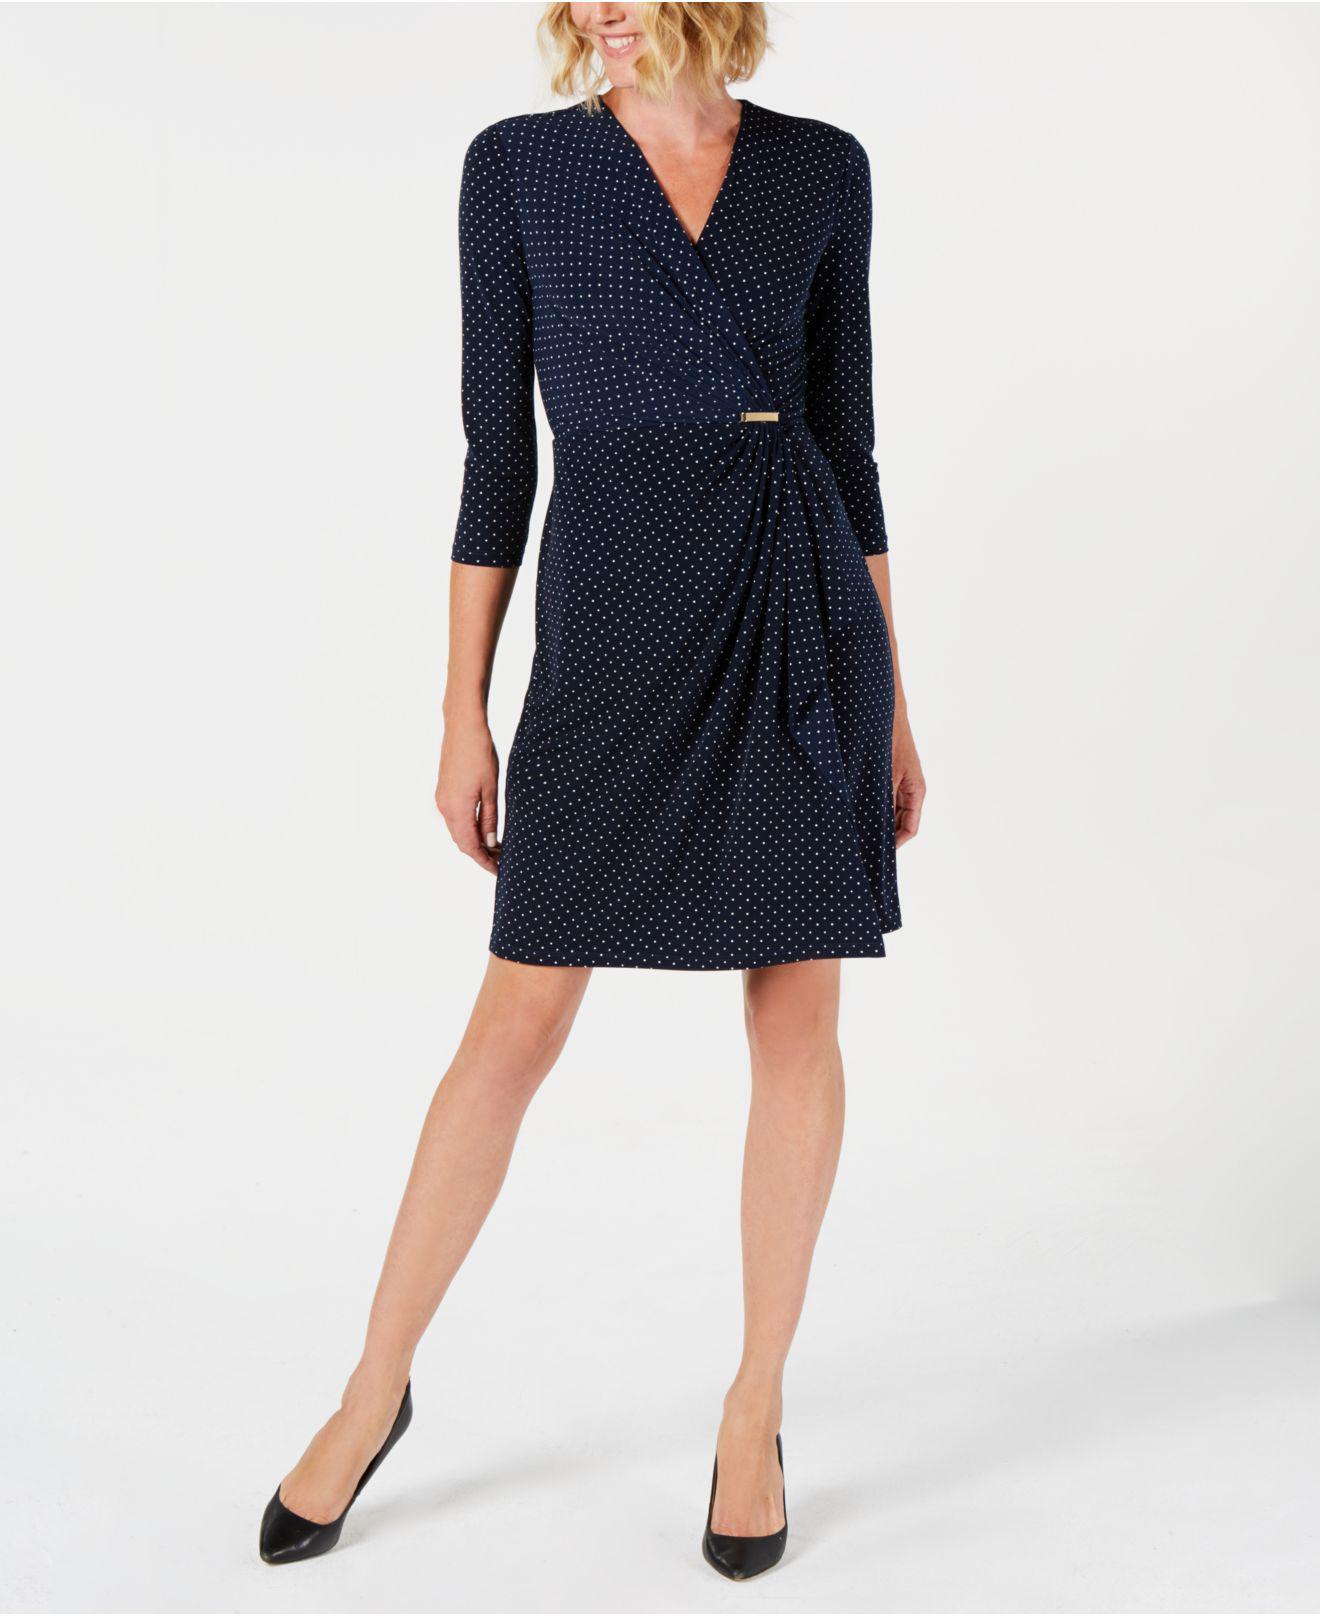 68c5f63c43 Lyst - Charter Club Petite Faux-wrap Dress